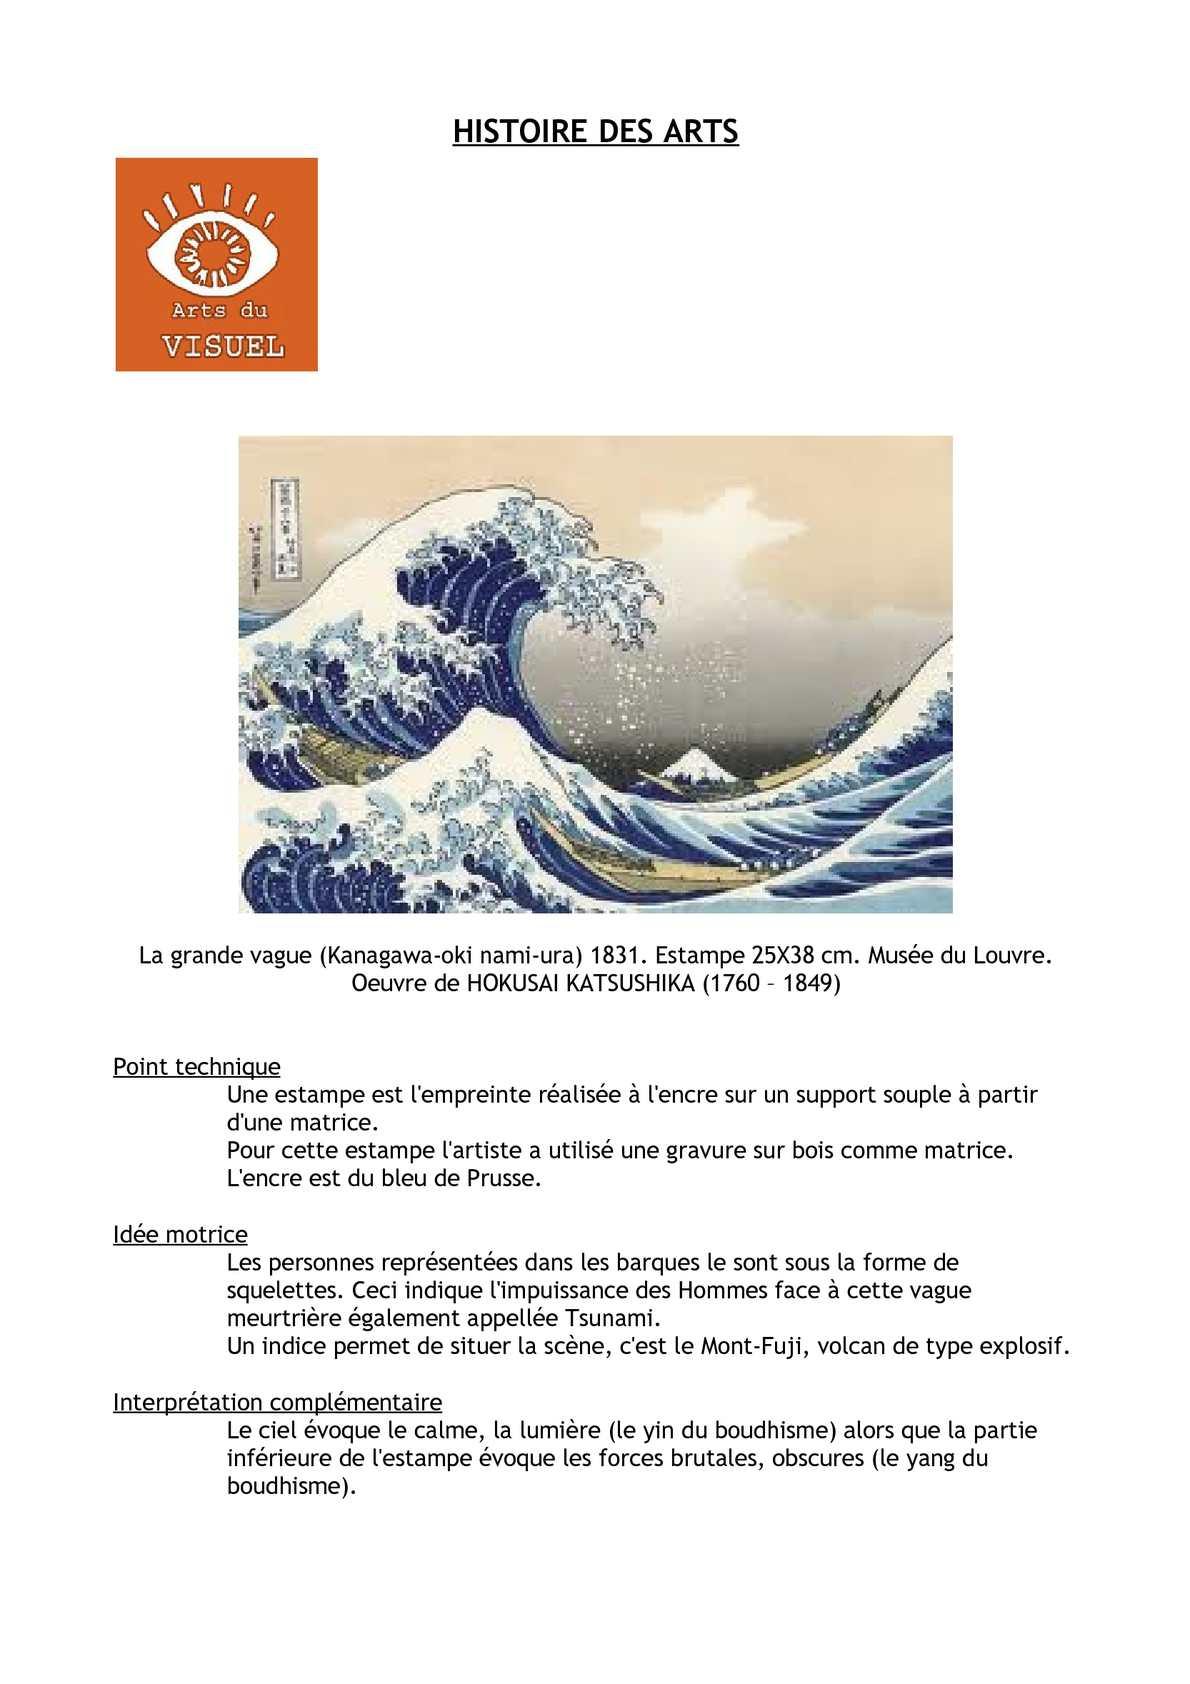 Hokusai Katsushika , La Grande Vague - Histoire de l'Art